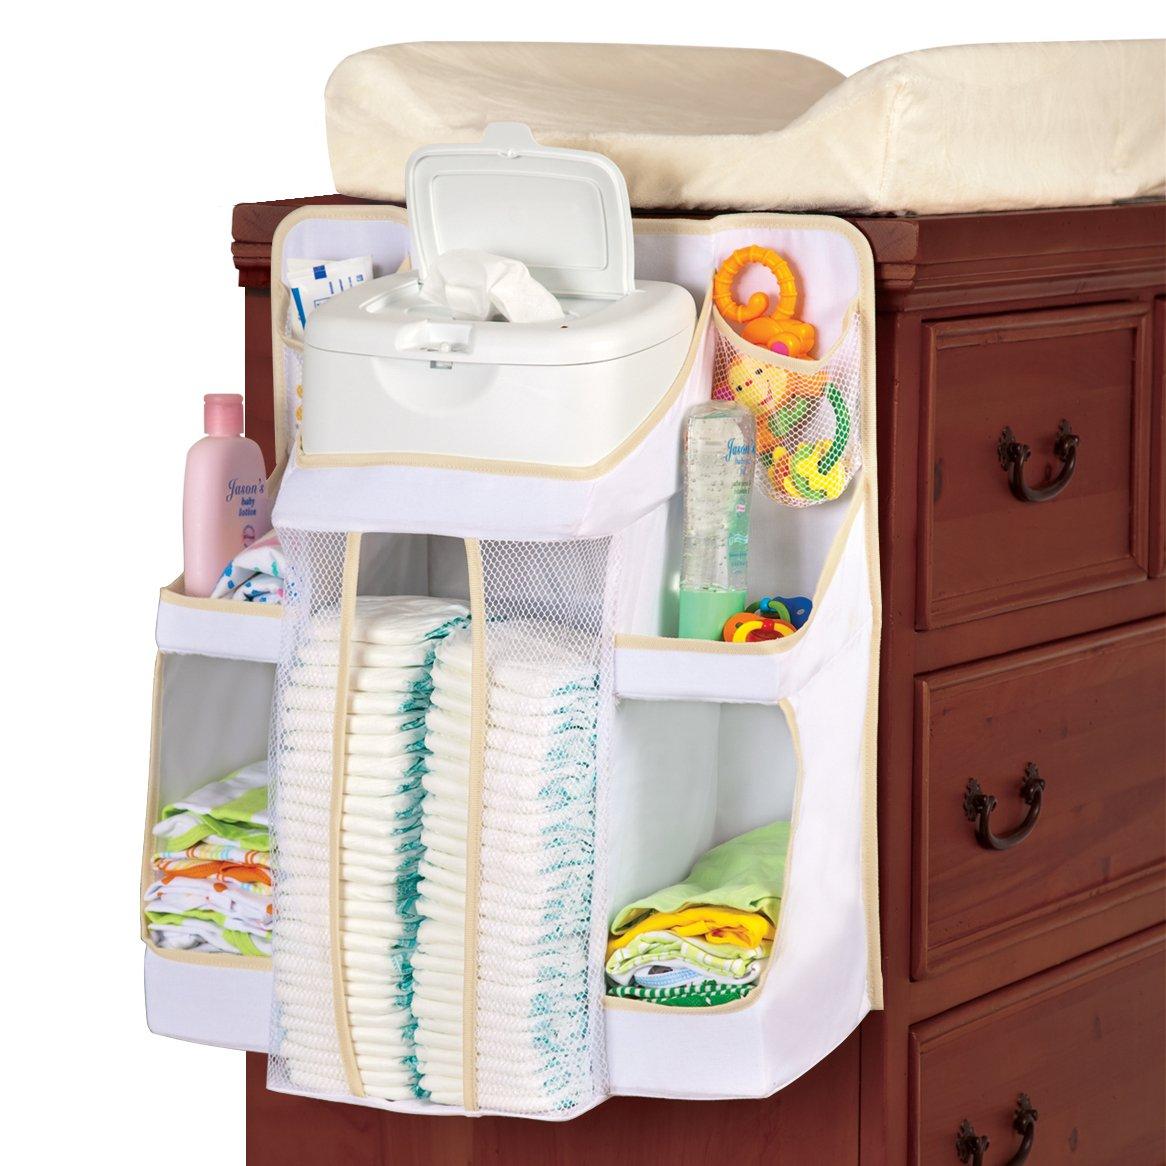 Amazon.com : Dexbaby Diaper Caddy and Nursery Organizer for Baby's  Essentials : Nursery Hanging Organizers : Baby